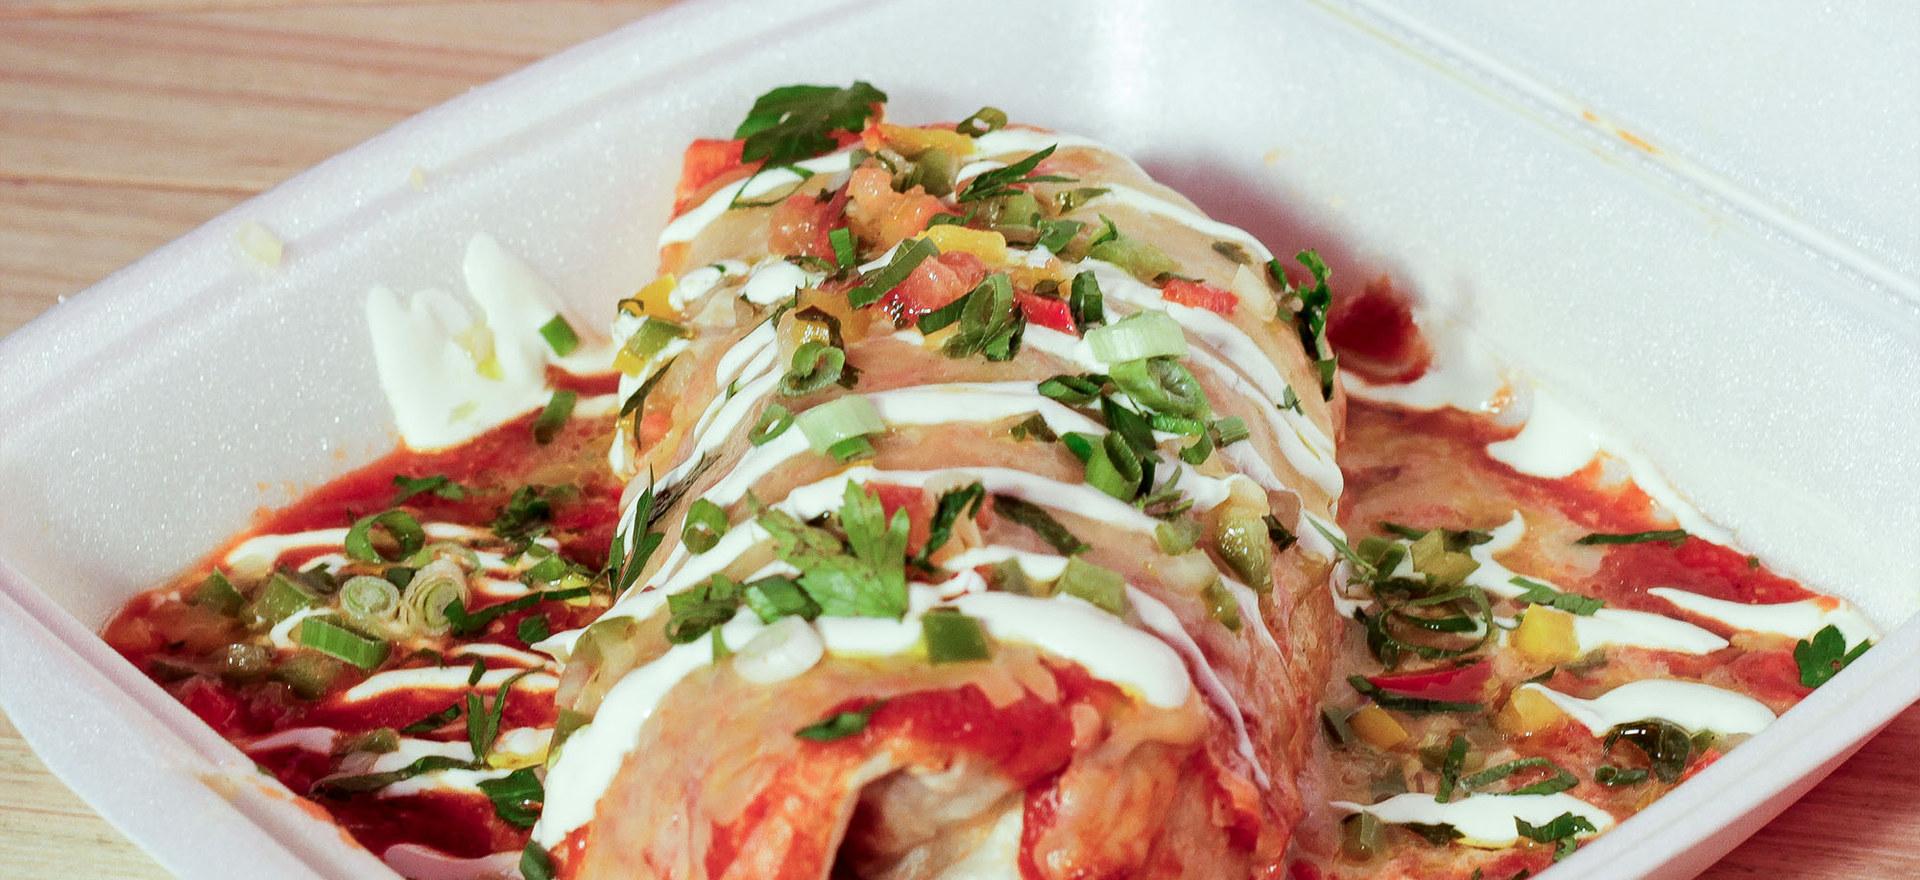 Mojado Burrito - Side View